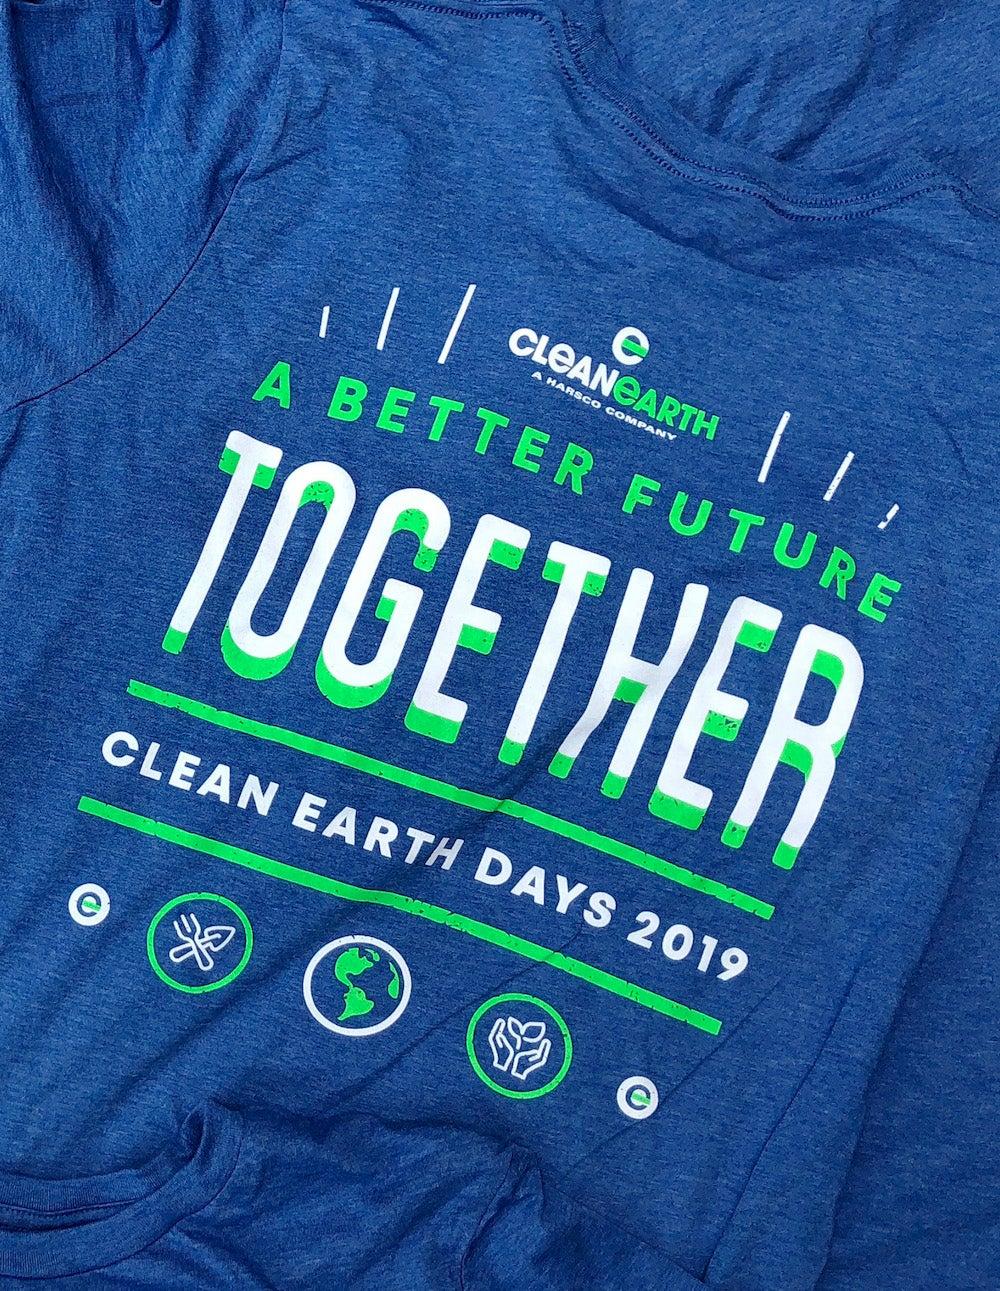 Clean_Earth_Days_2019